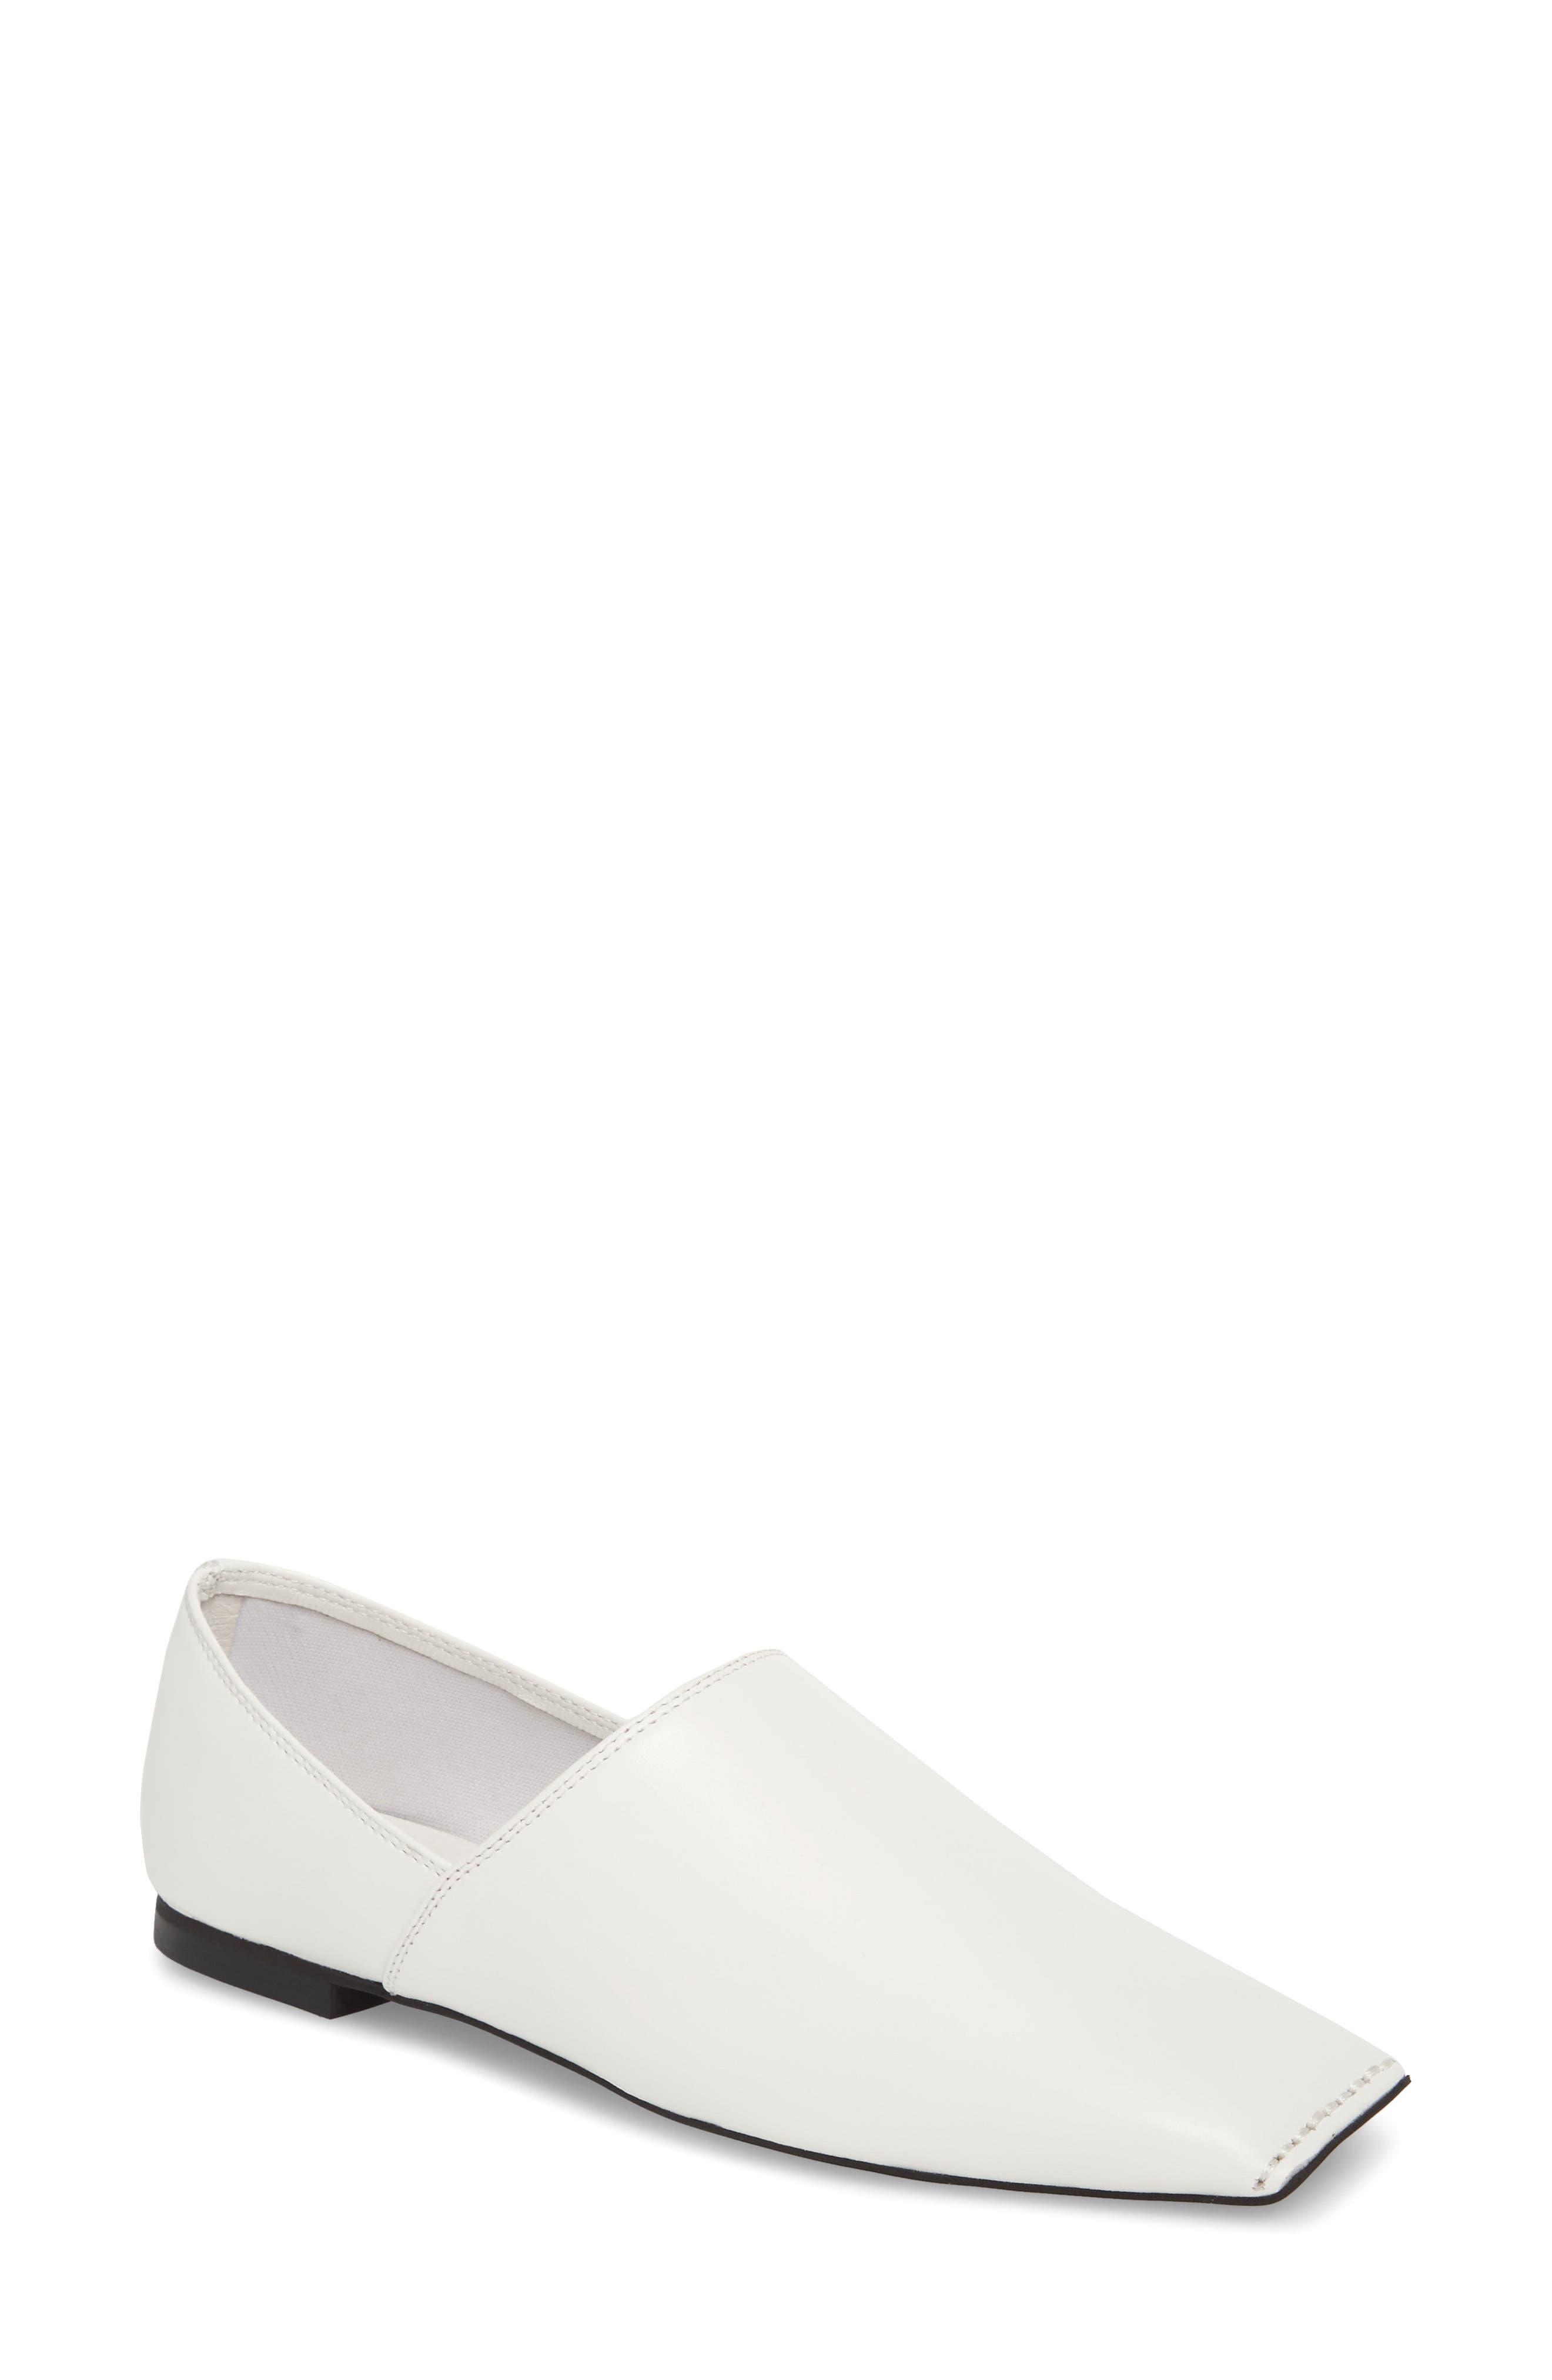 Lanvale Blunted Toe Flat,                             Main thumbnail 1, color,                             White